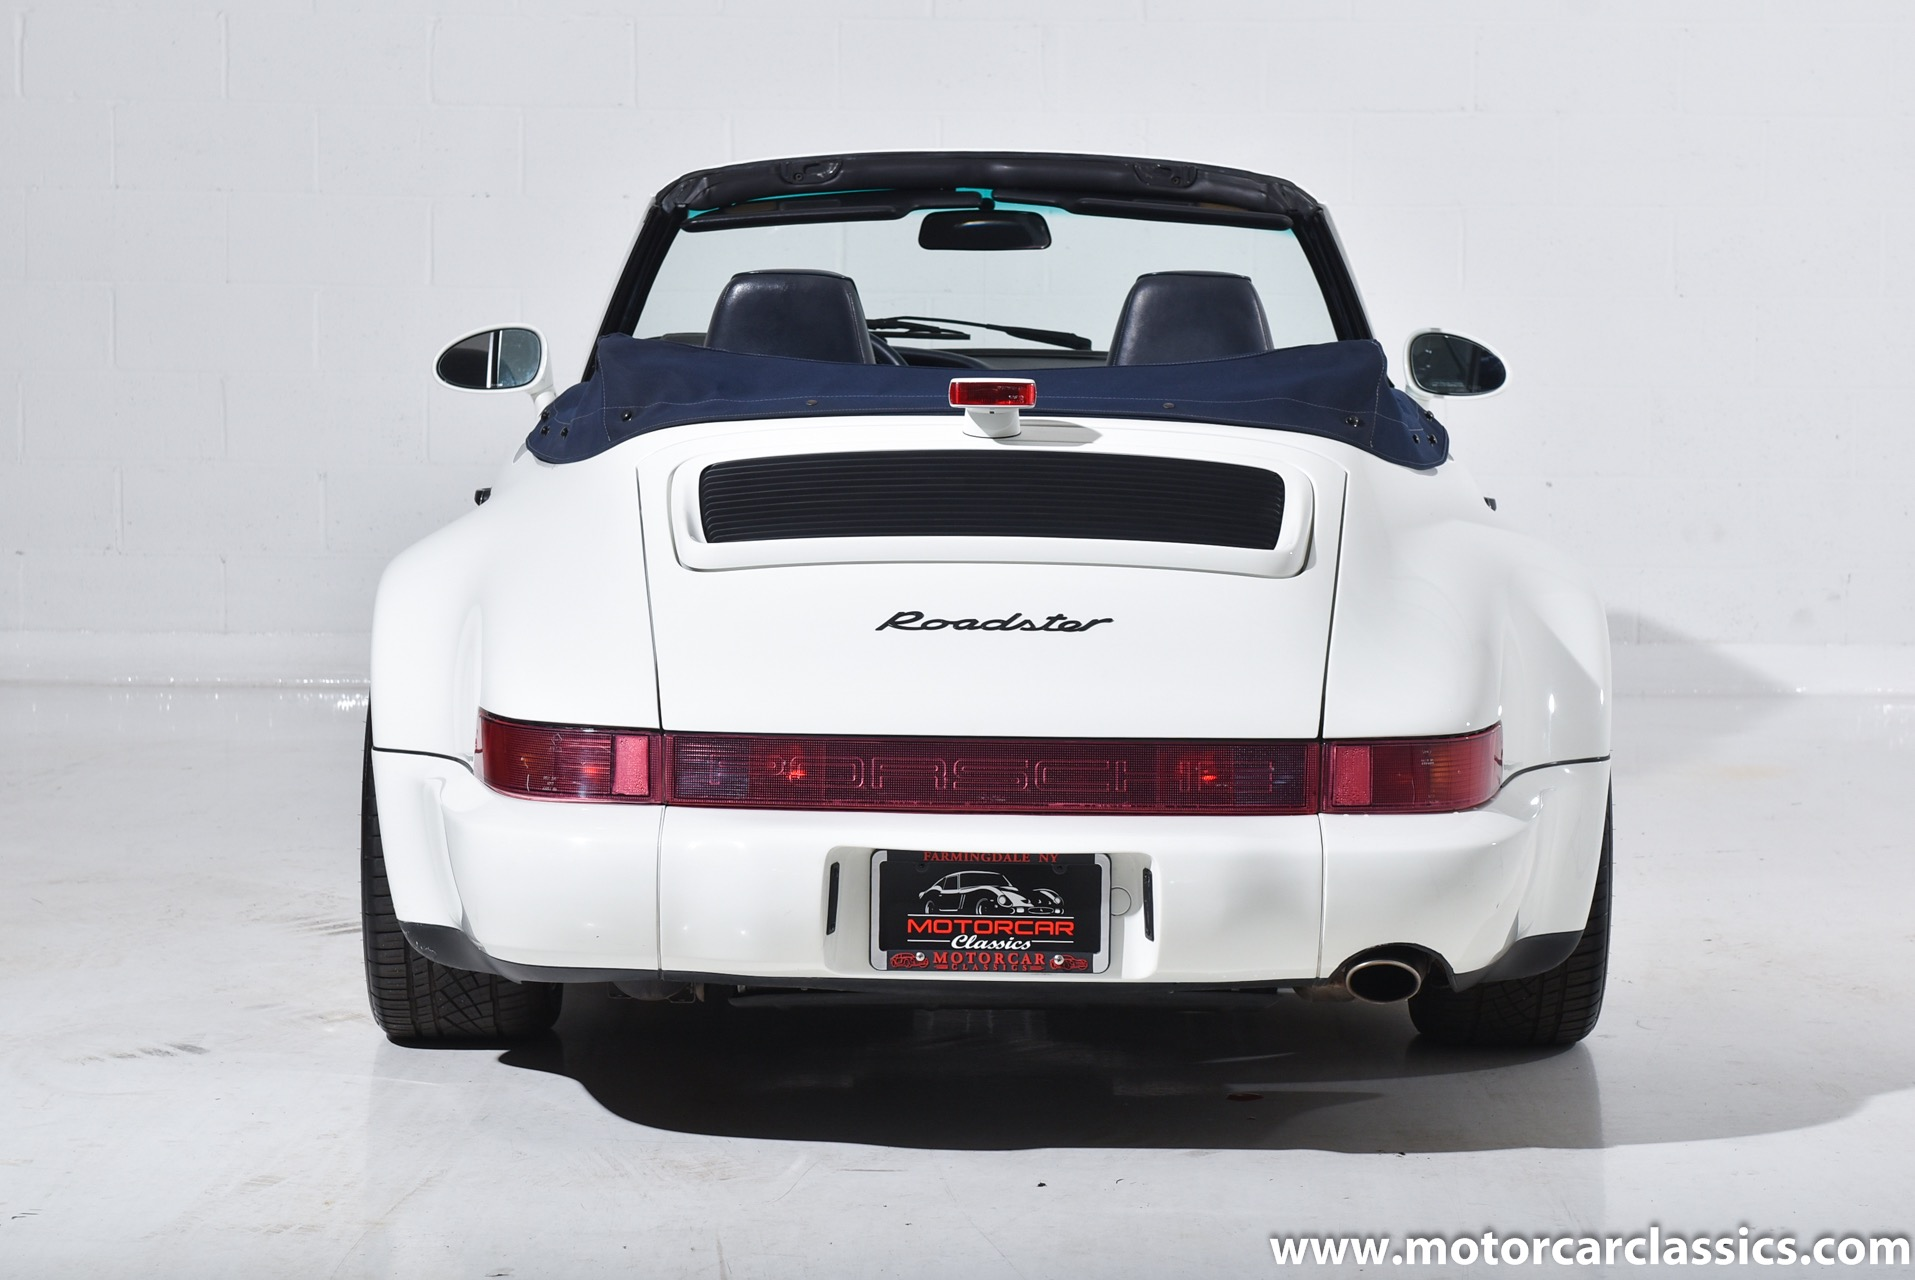 1993 Porsche 911 America Roadster